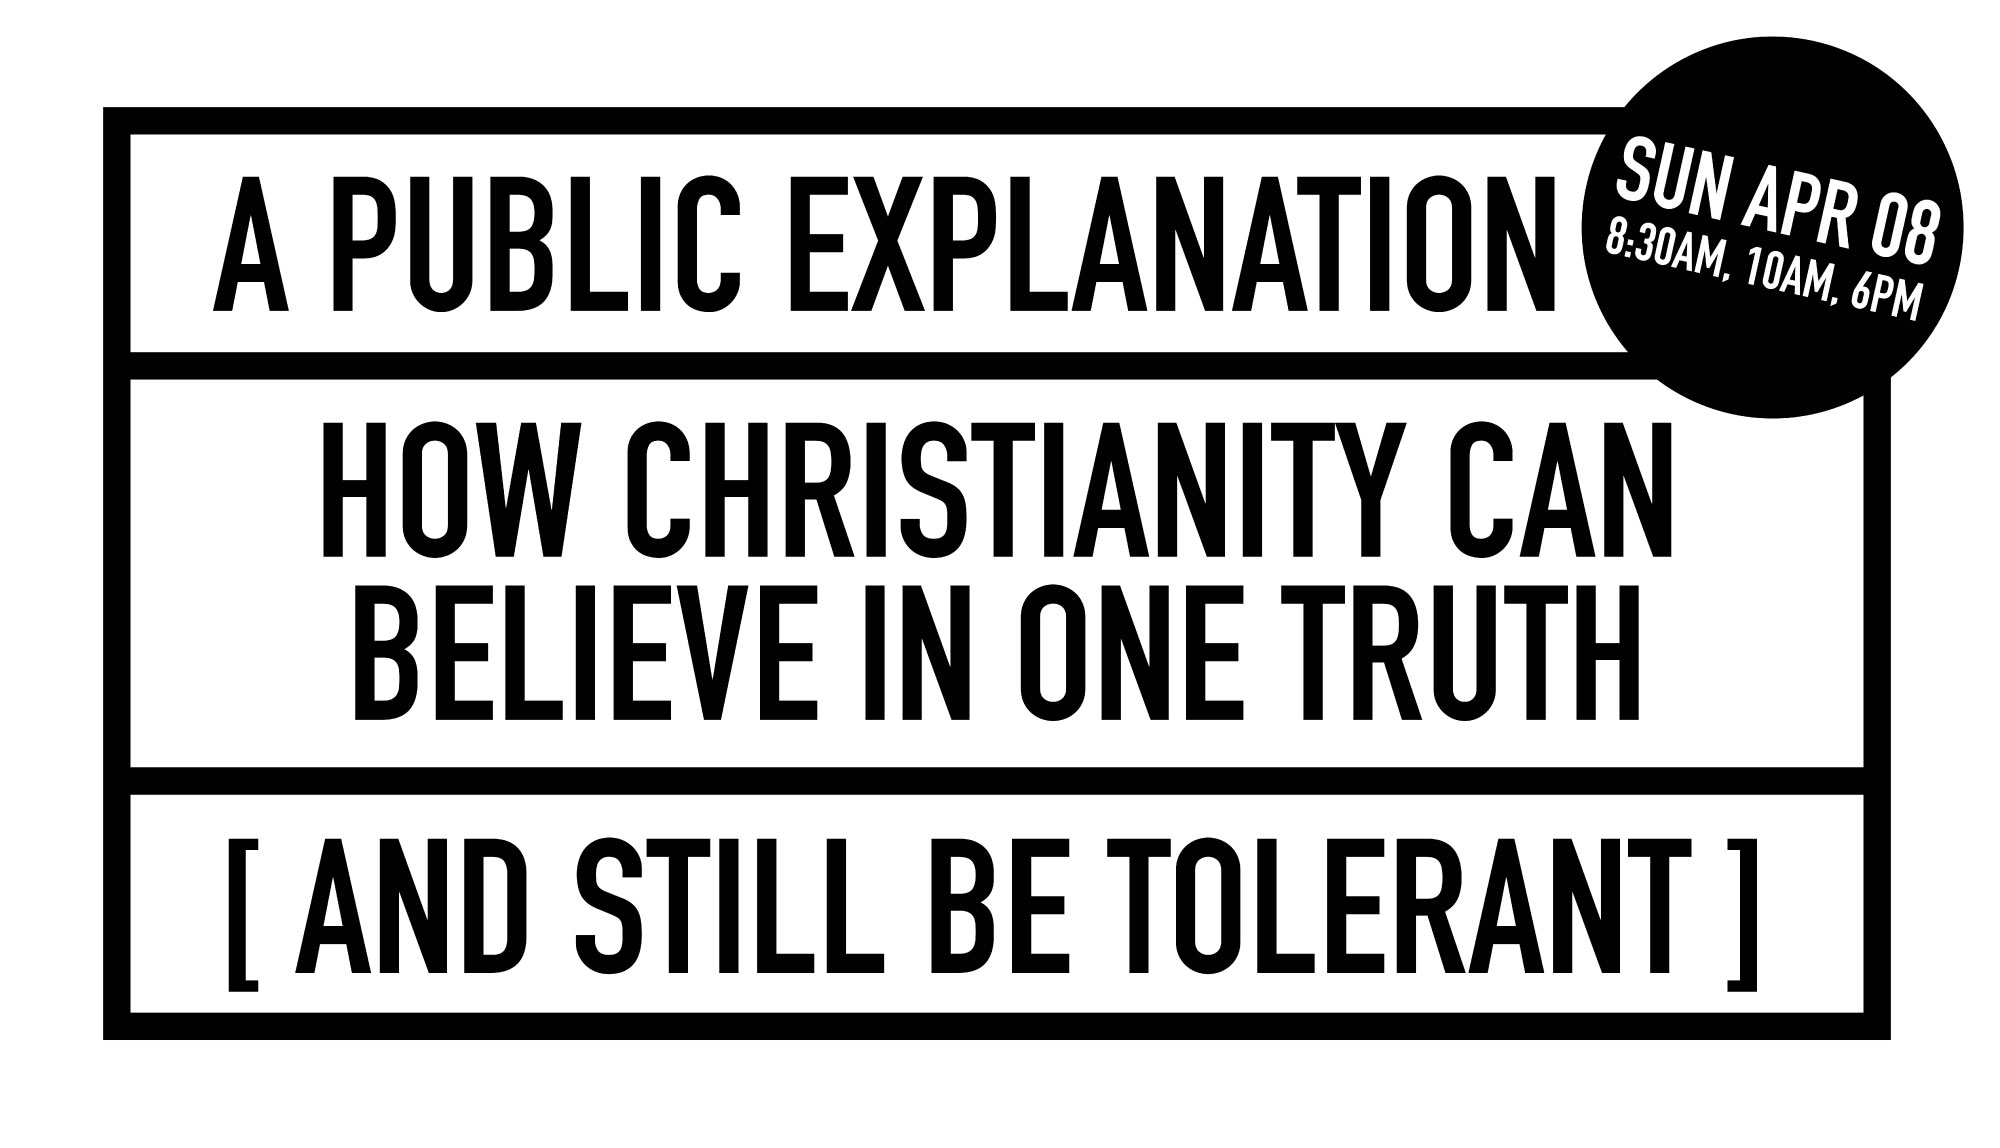 Public-Christianity_web.jpg